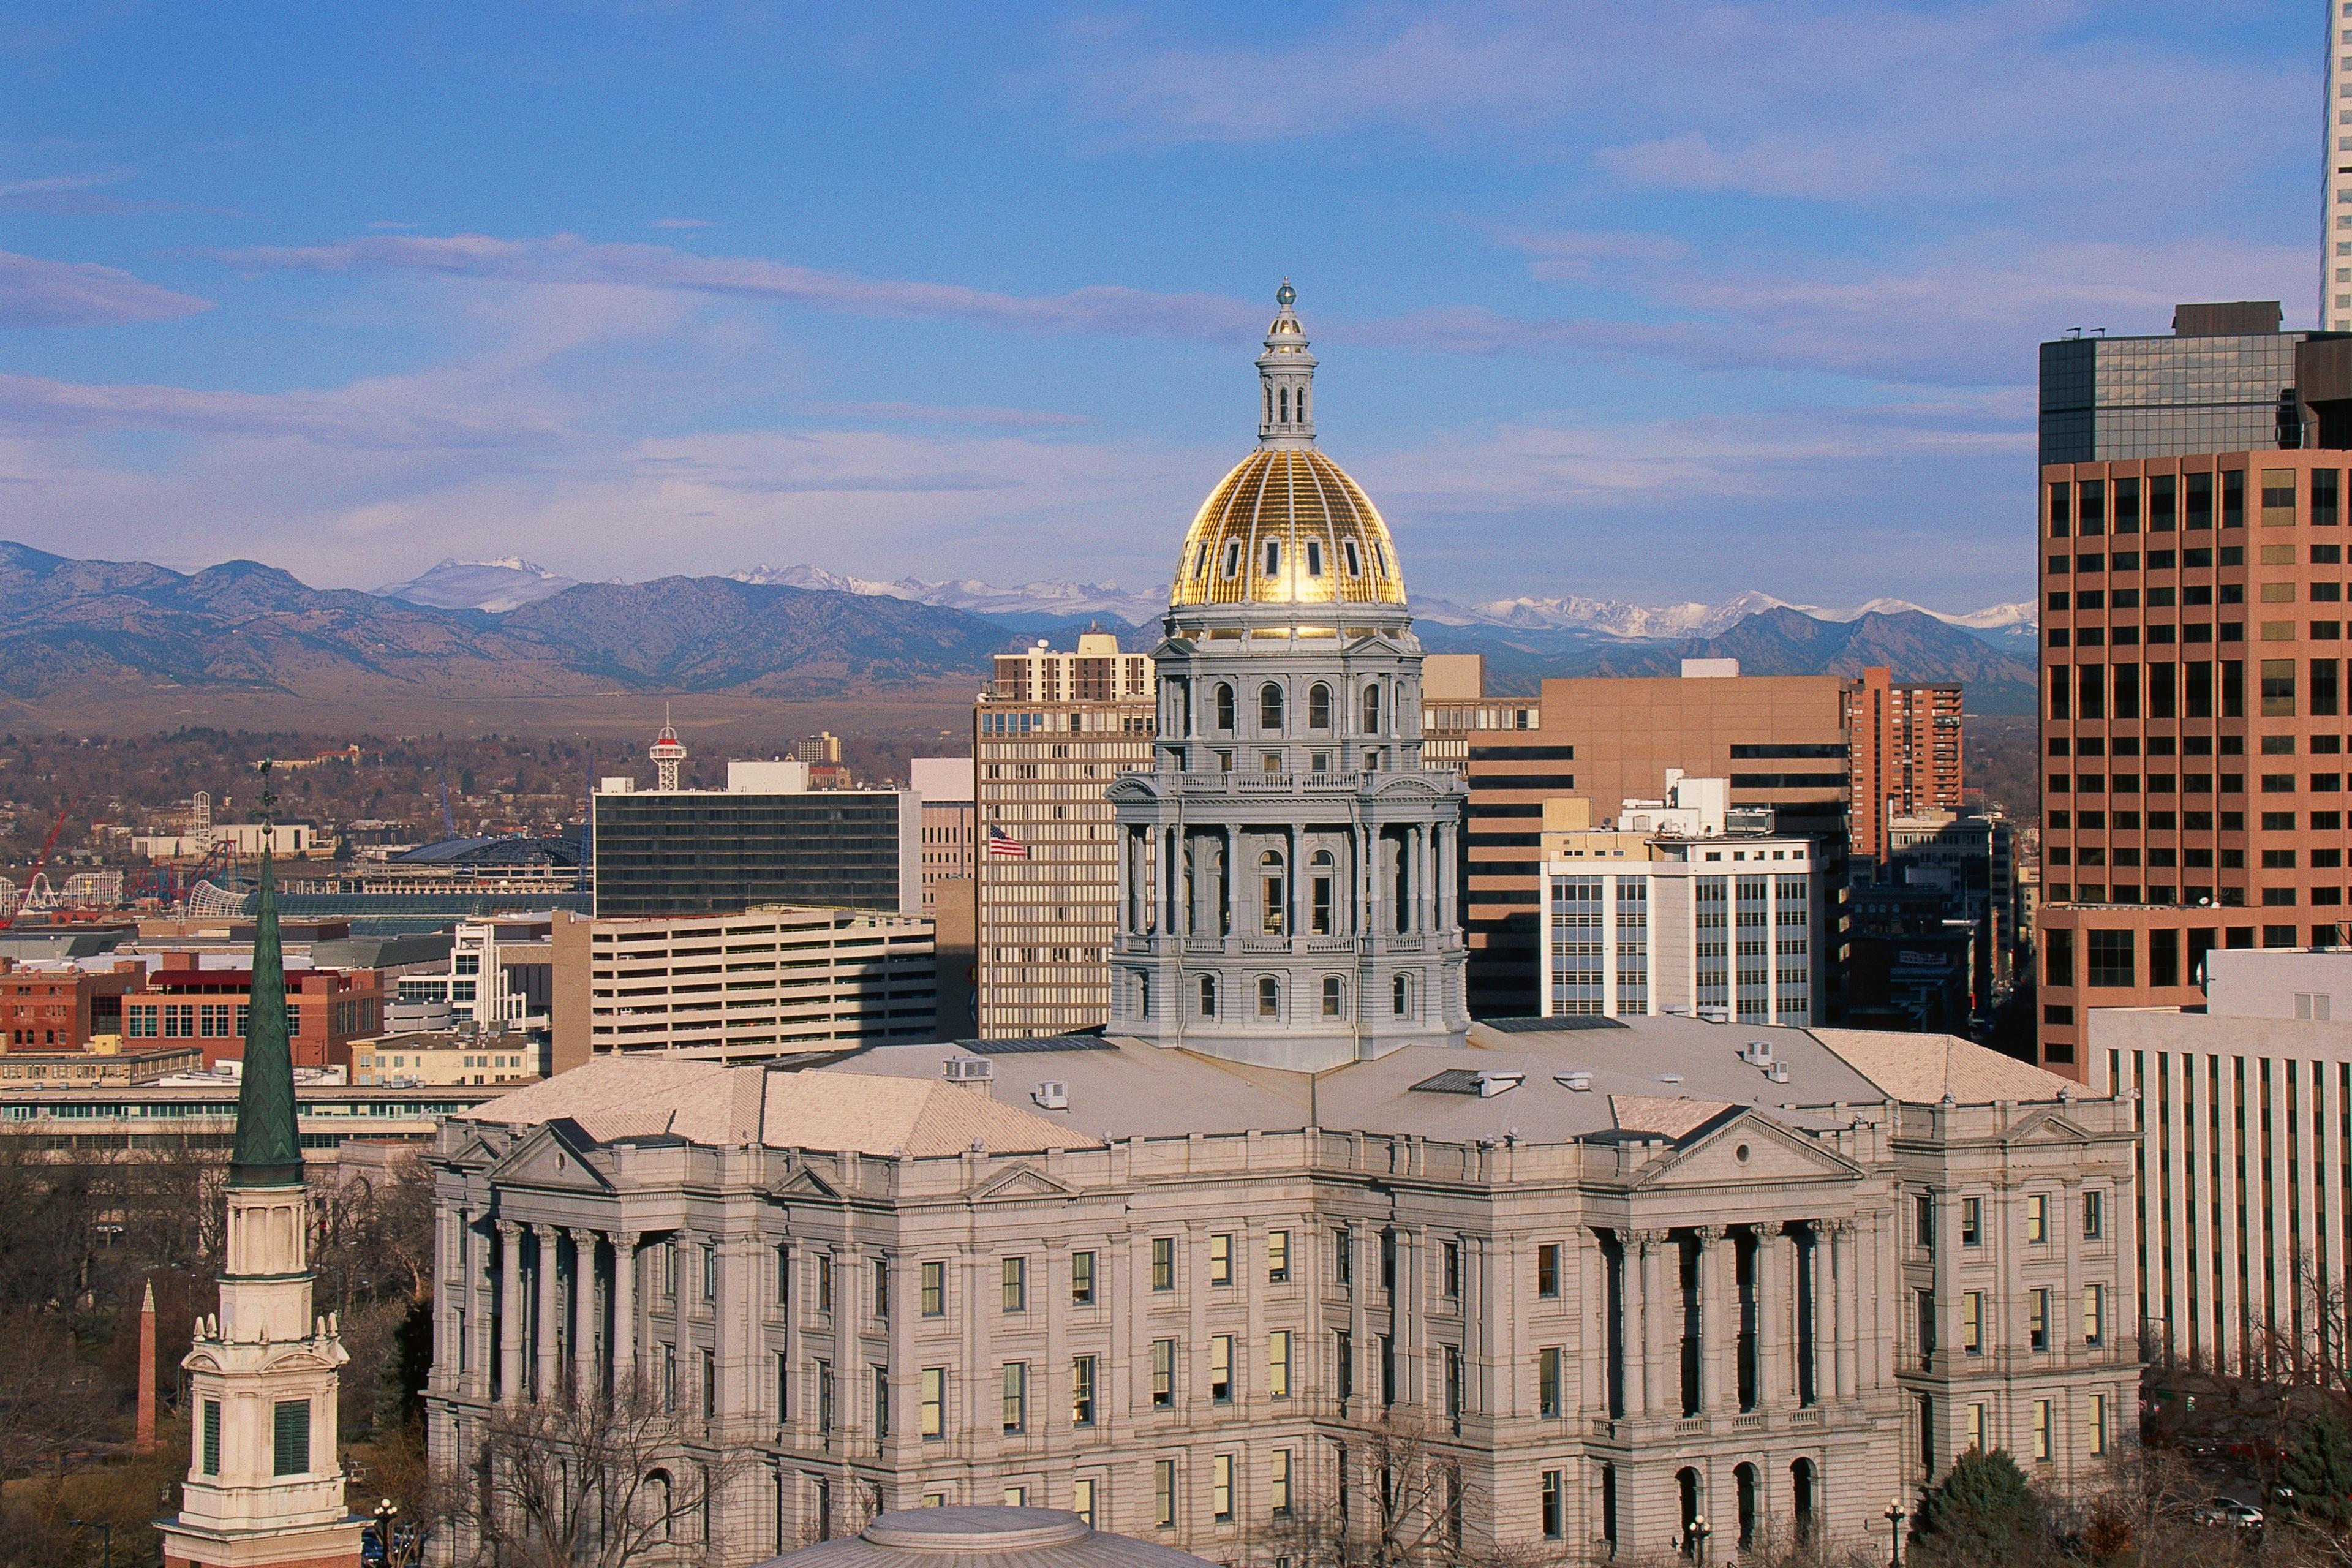 Capitol Hill, Denver, Colorado, United States of America